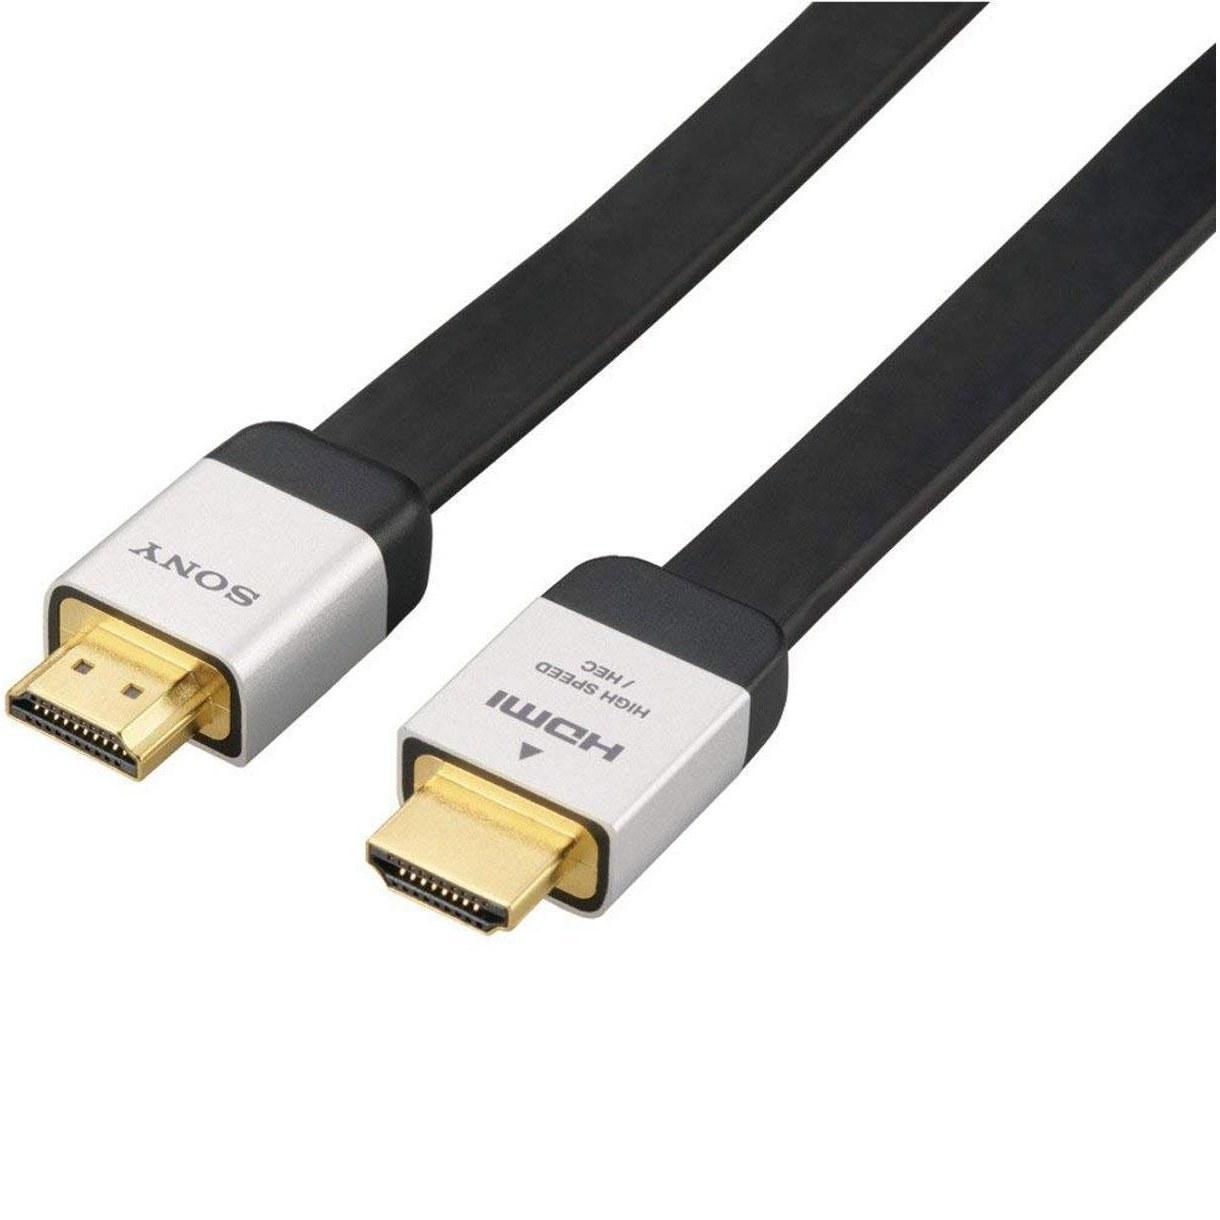 کابل HDMI سونی